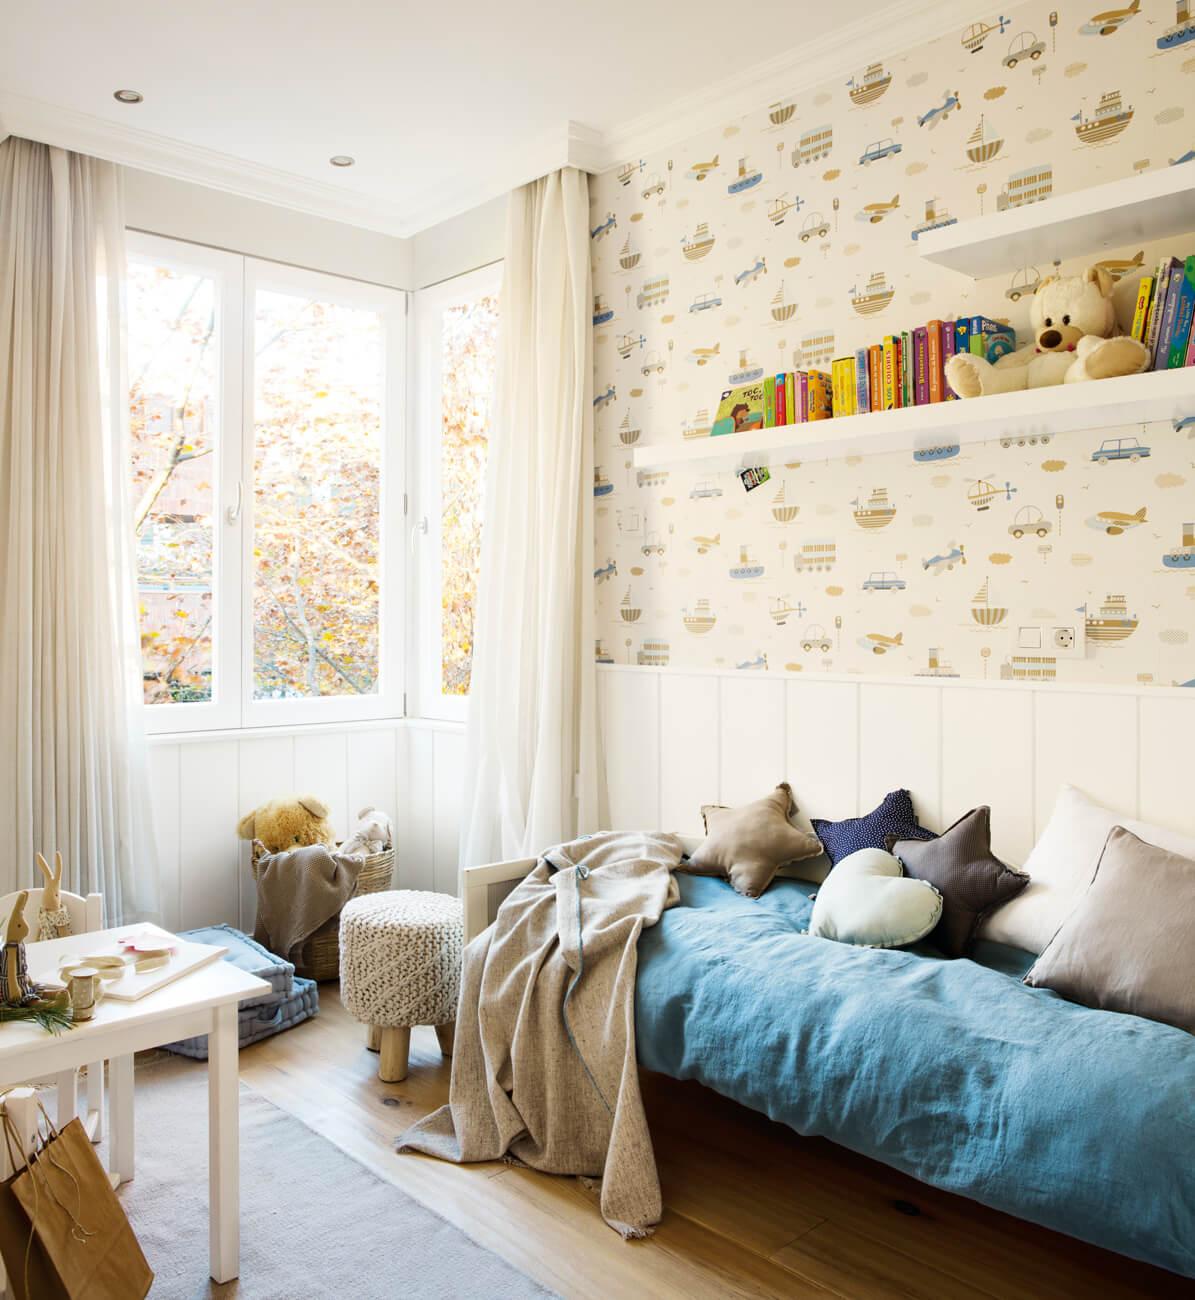 dormitorio infantil decorado tipo nórdico